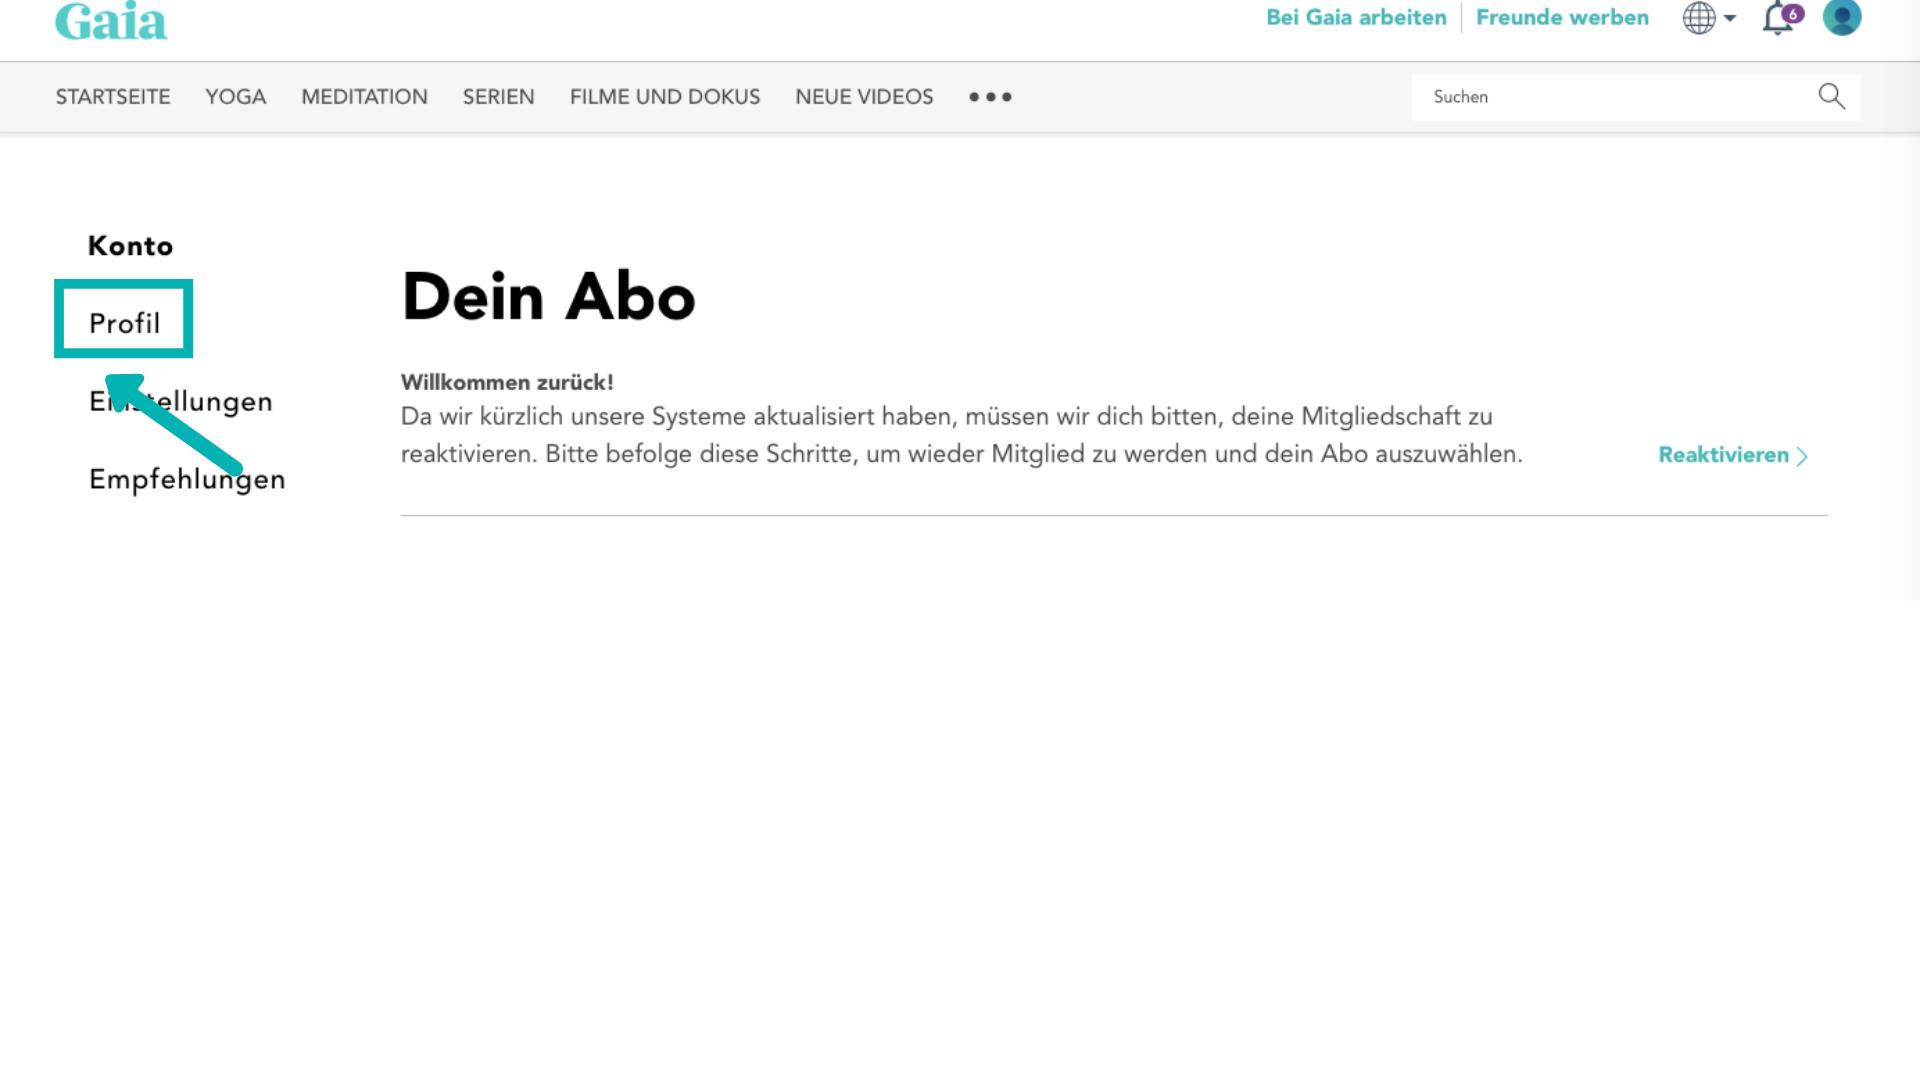 desktop-profile-3_en-us.png